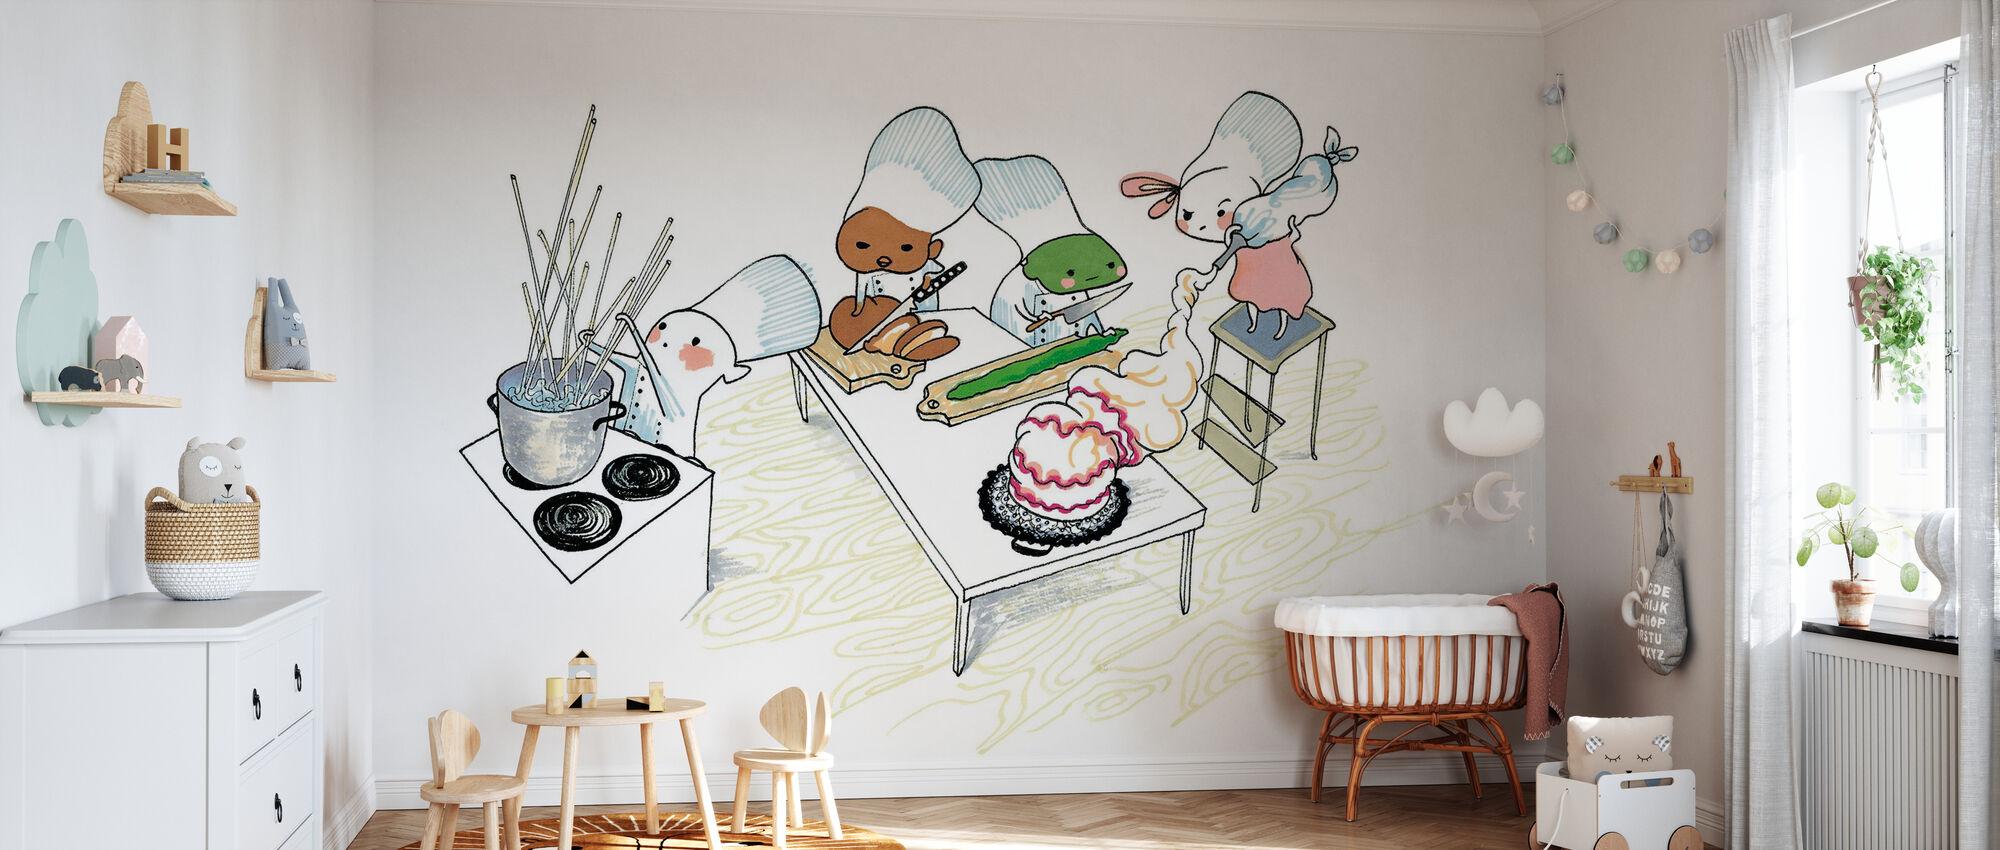 Kitchen - Wallpaper - Nursery